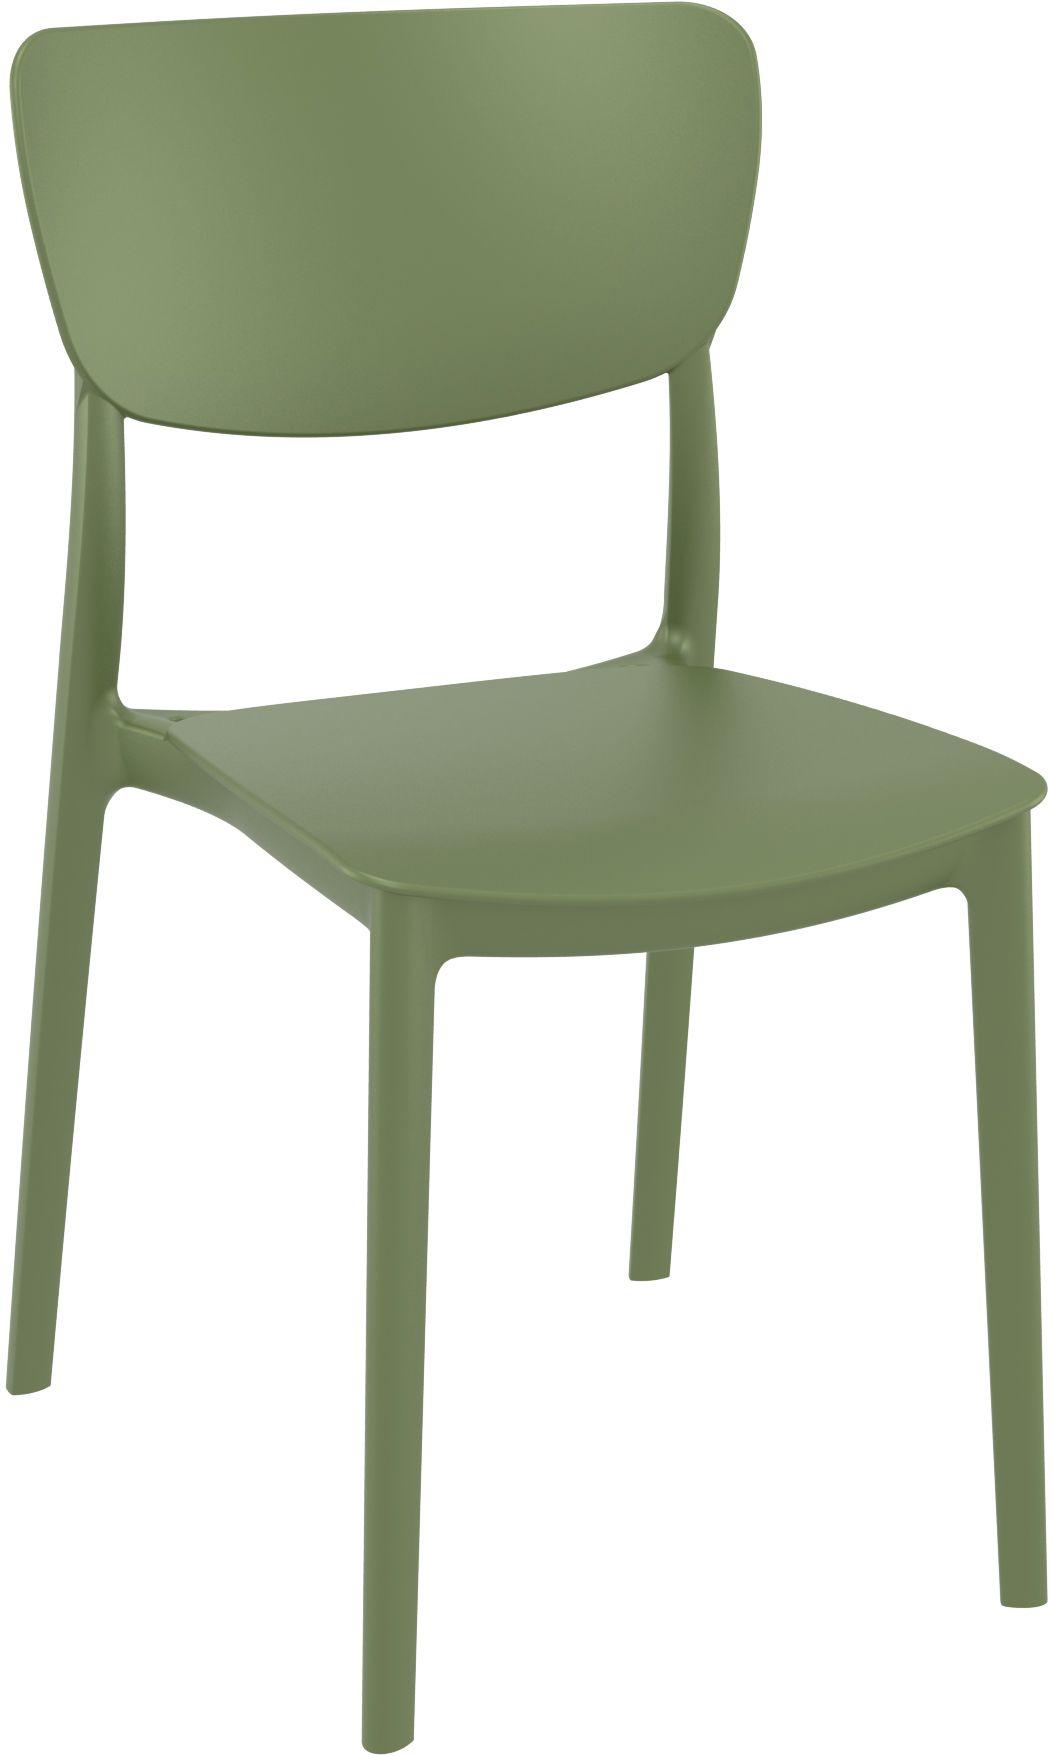 014 monna olive green front side